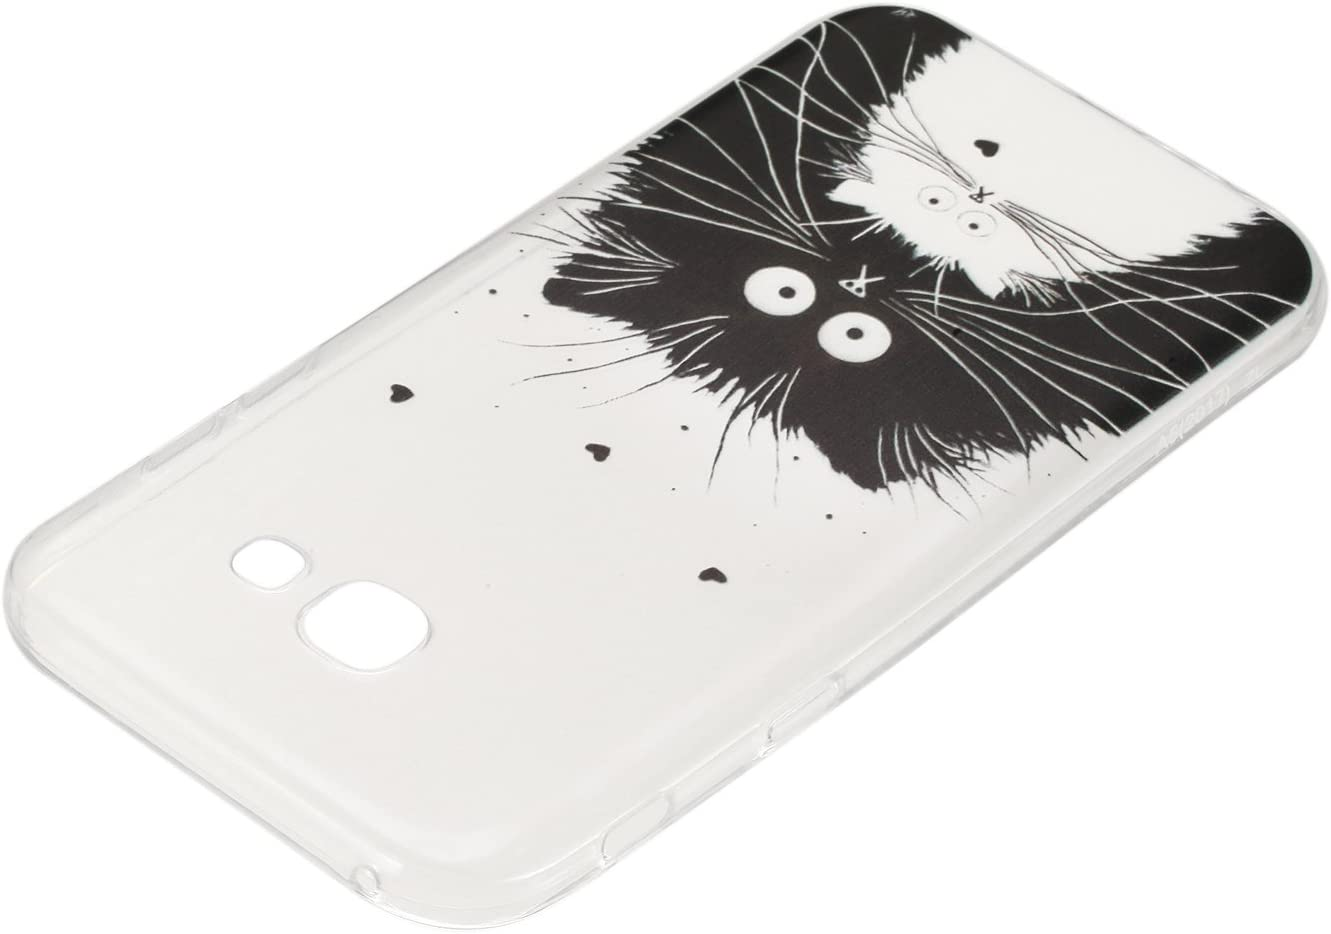 V-Ted Coque Samsung Galaxy A5 2016 Ananas Silicone Ultra Fine Mince Bumper Housse Etui Cover Transparente avec Motif Dessin Antichoc Incassable